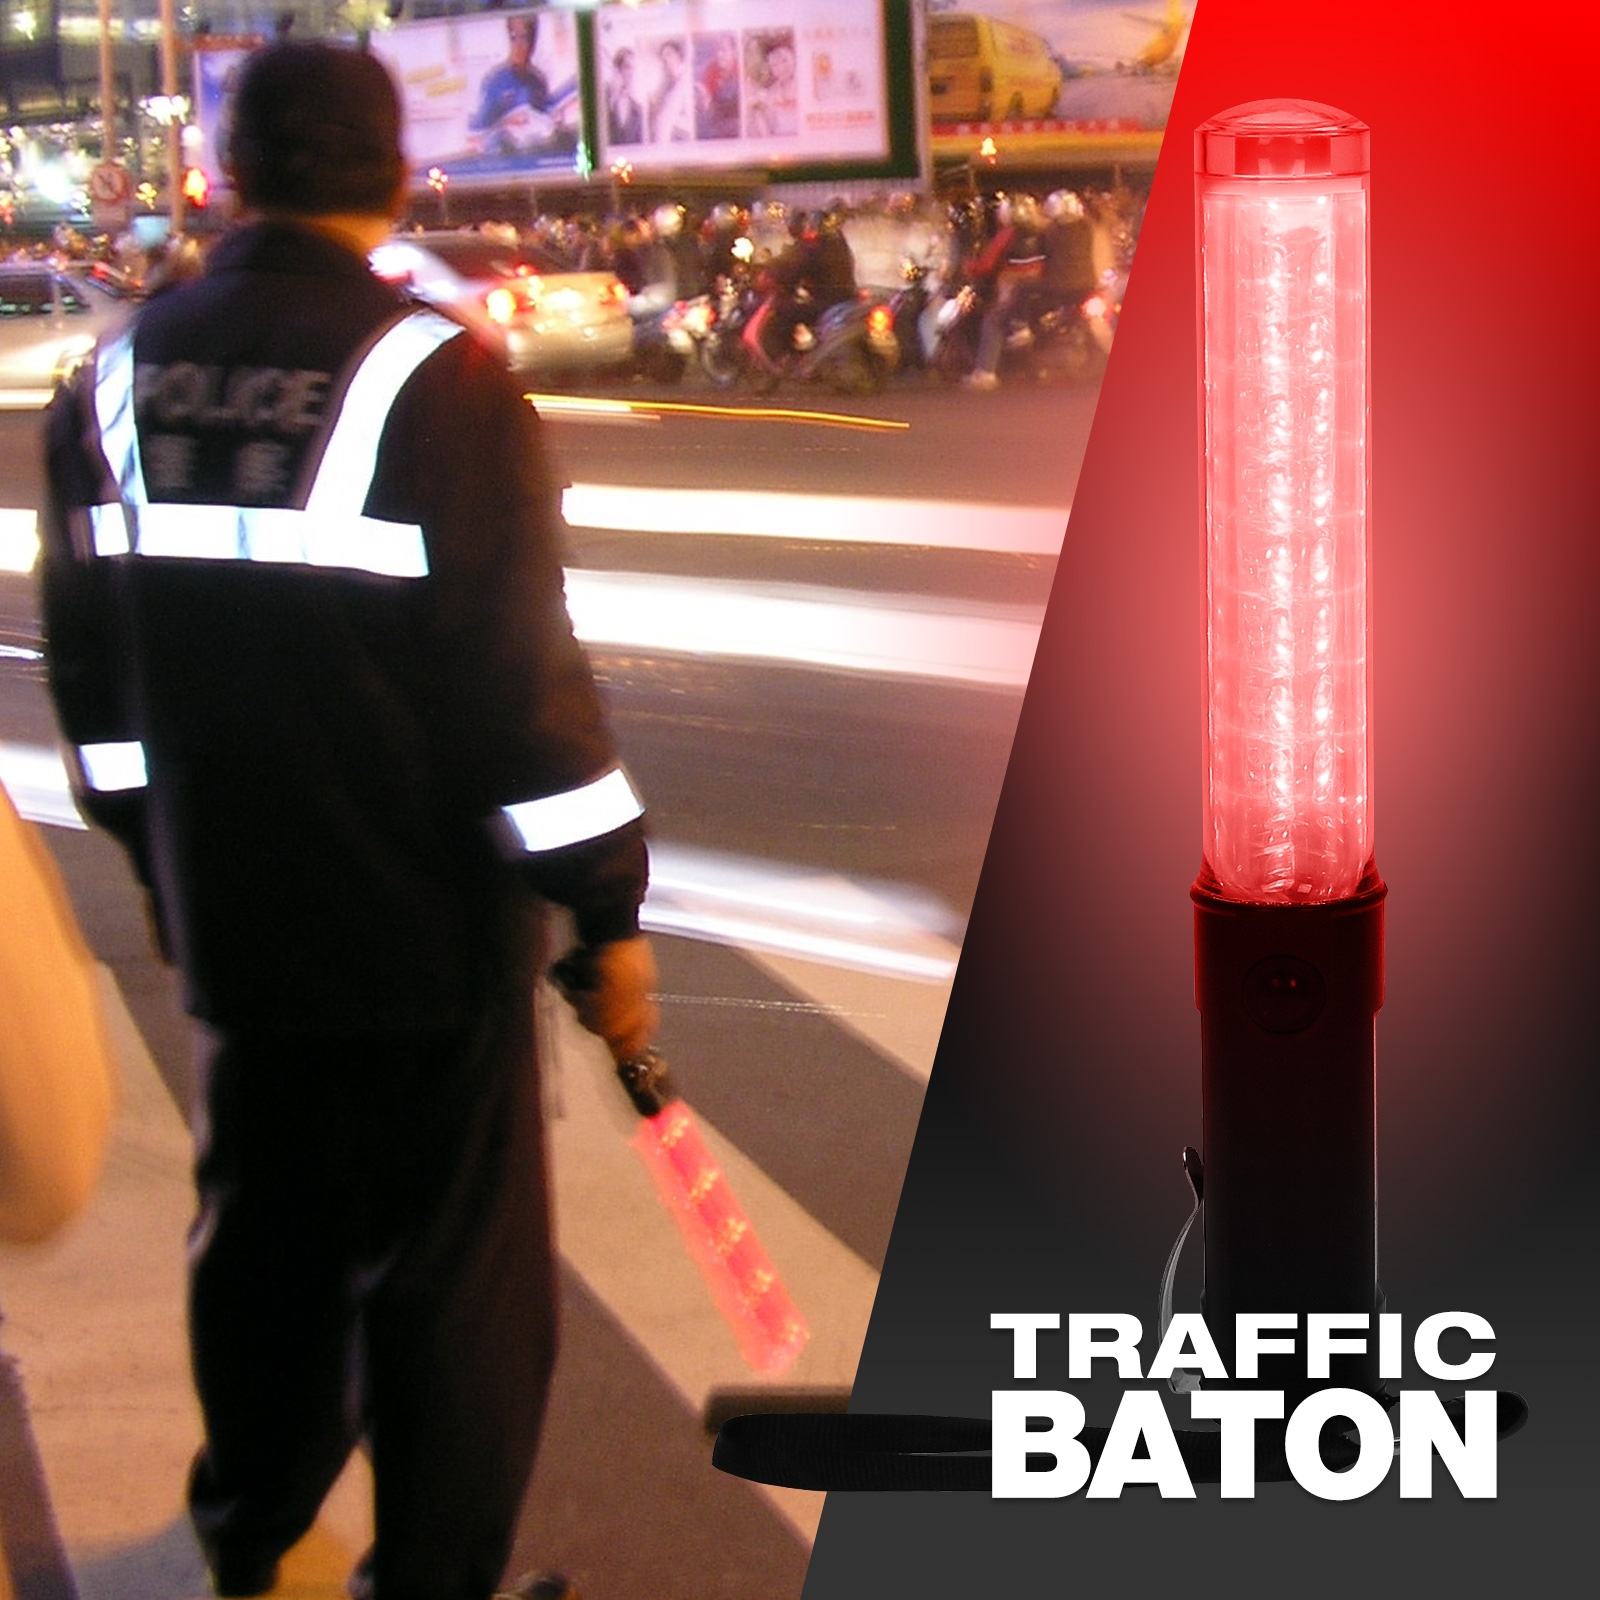 Light Up Traffic Baton And Torch